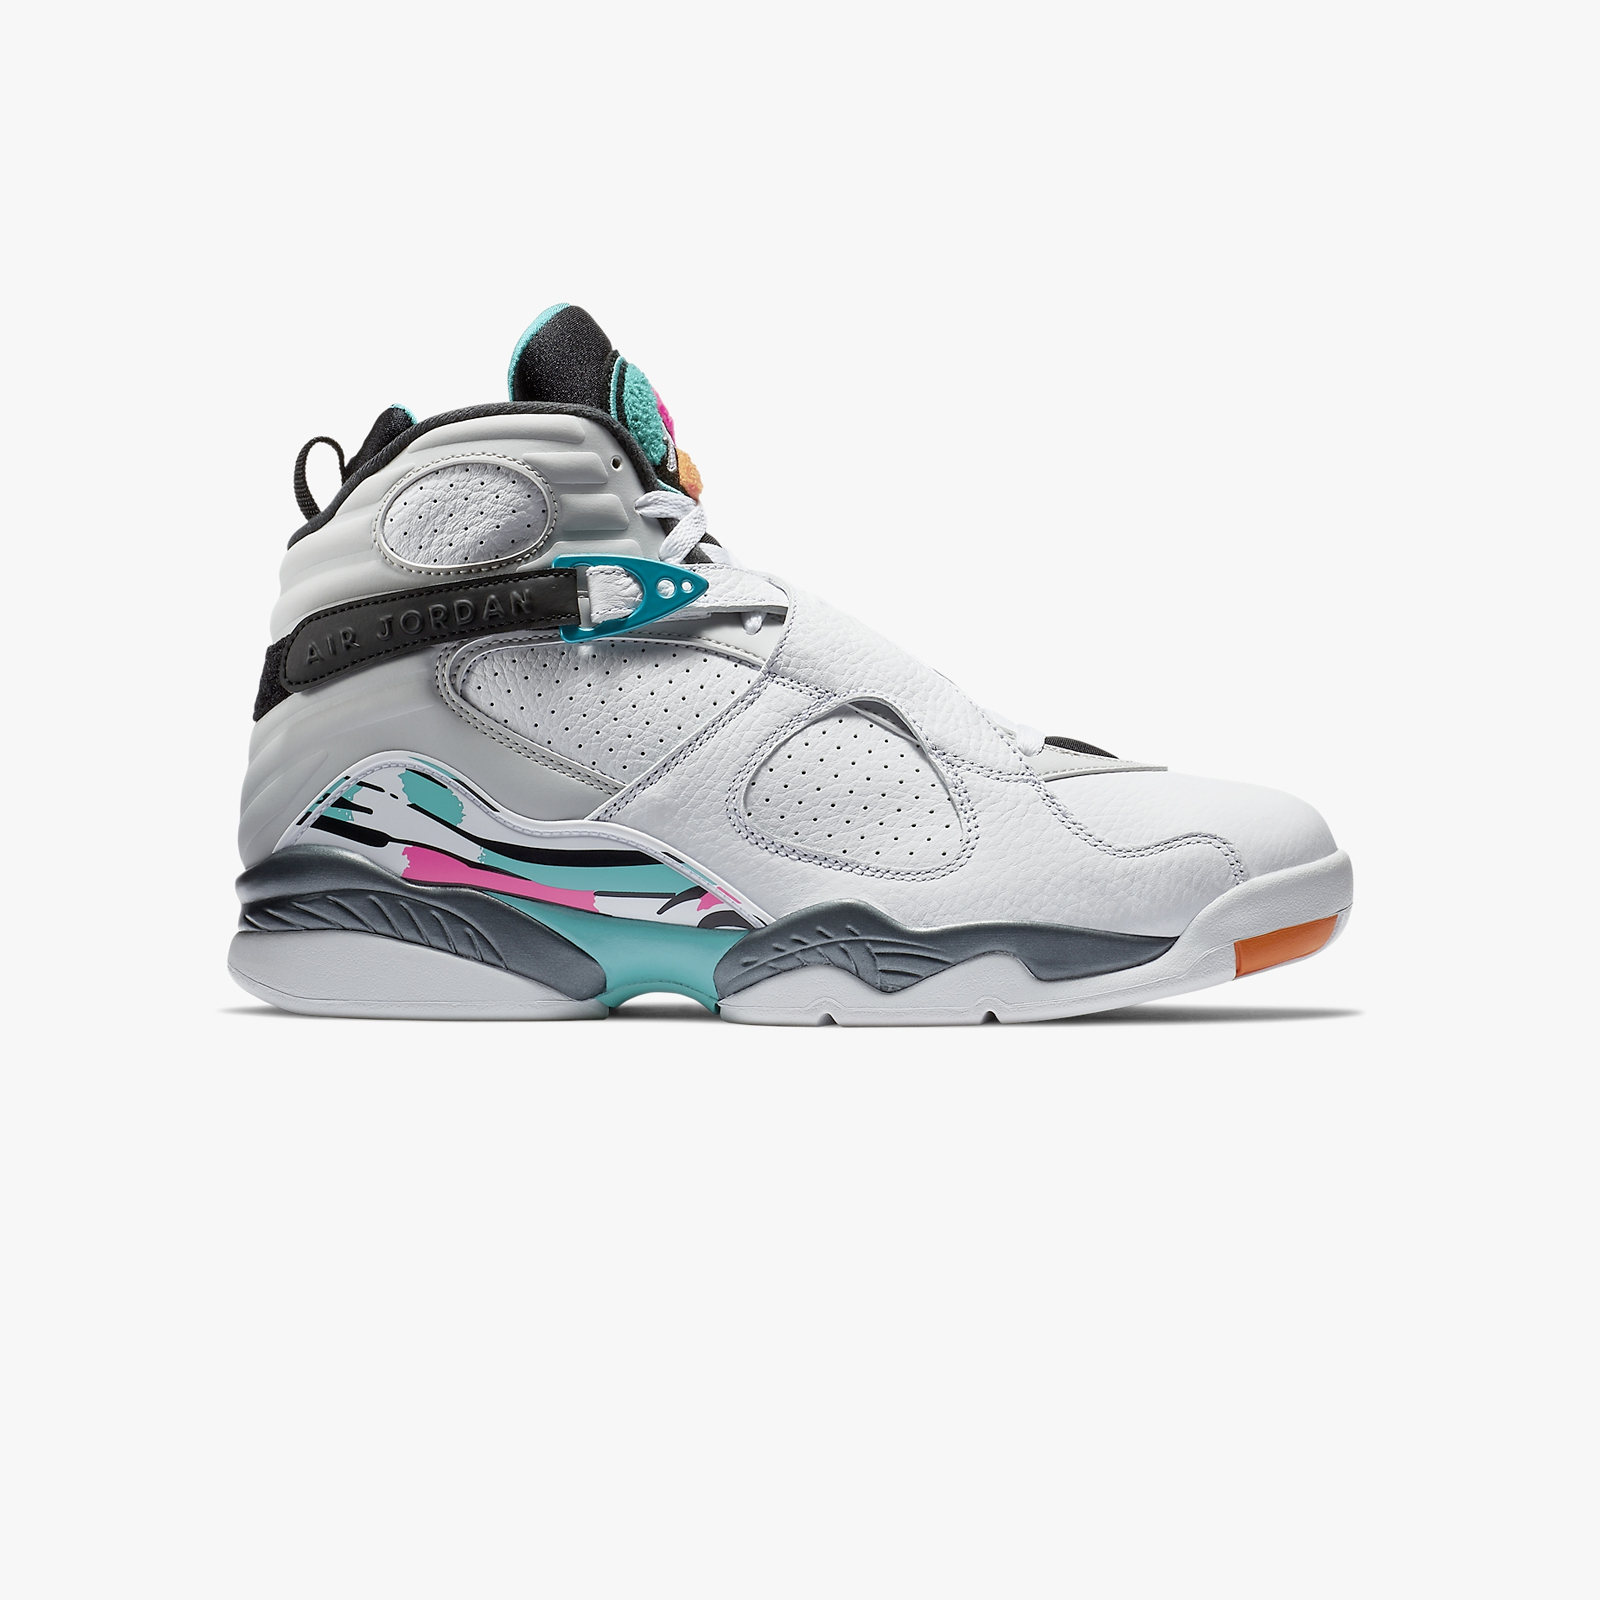 0f6b347f00a42 Jordan Brand Air Jordan 8 Retro - 305381-113 - Sneakersnstuff ...